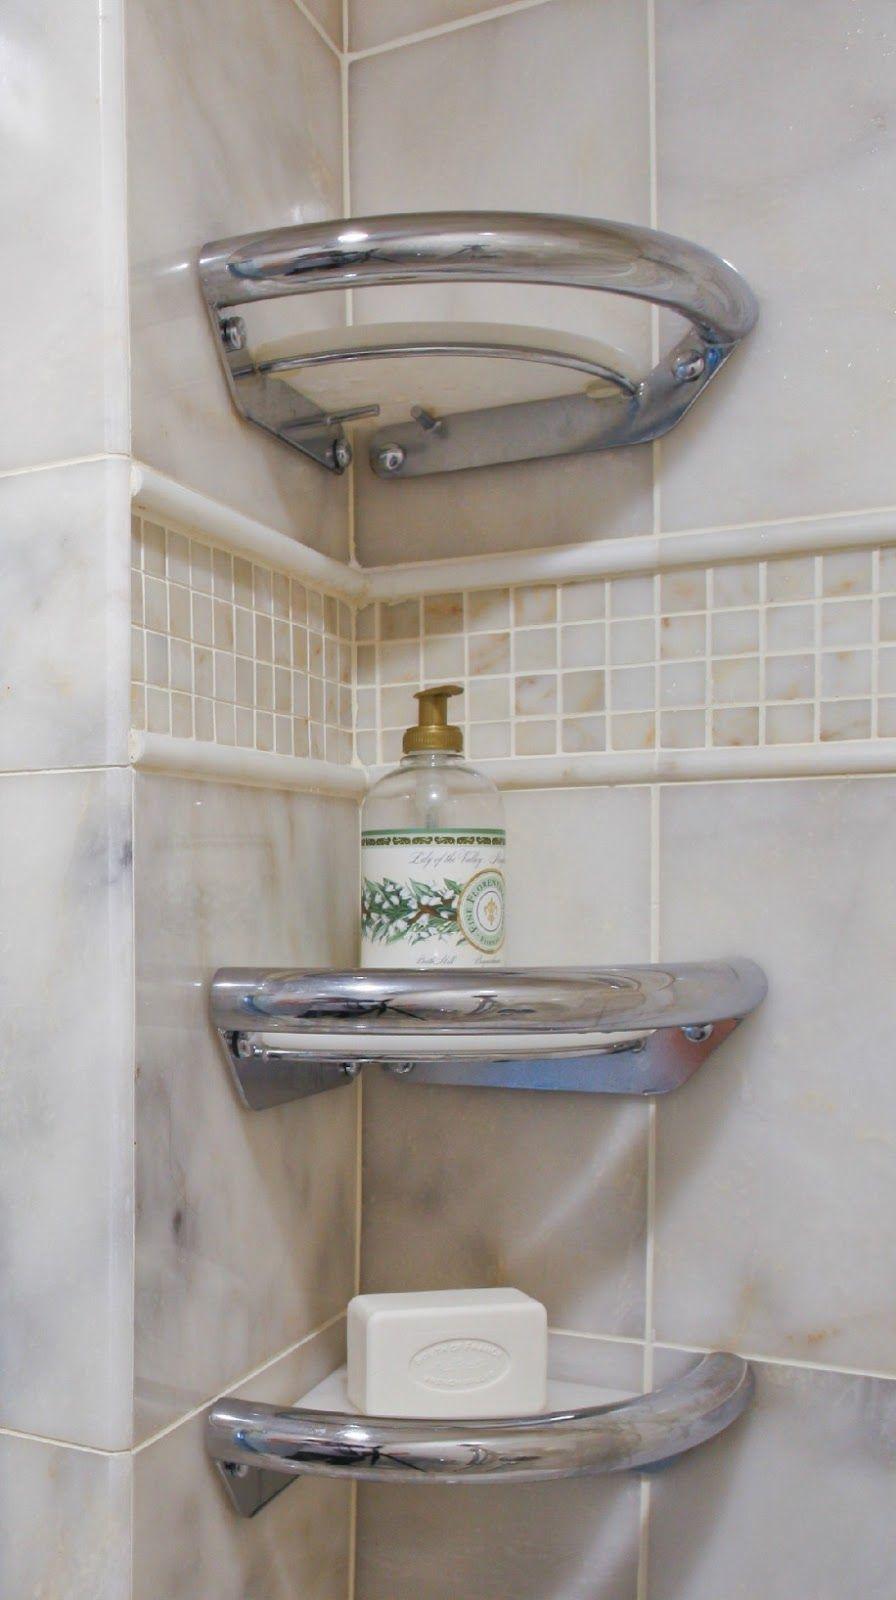 Grab Bars Bathroom Google Search Universal Designs Pinterest Grab Bars And Bar